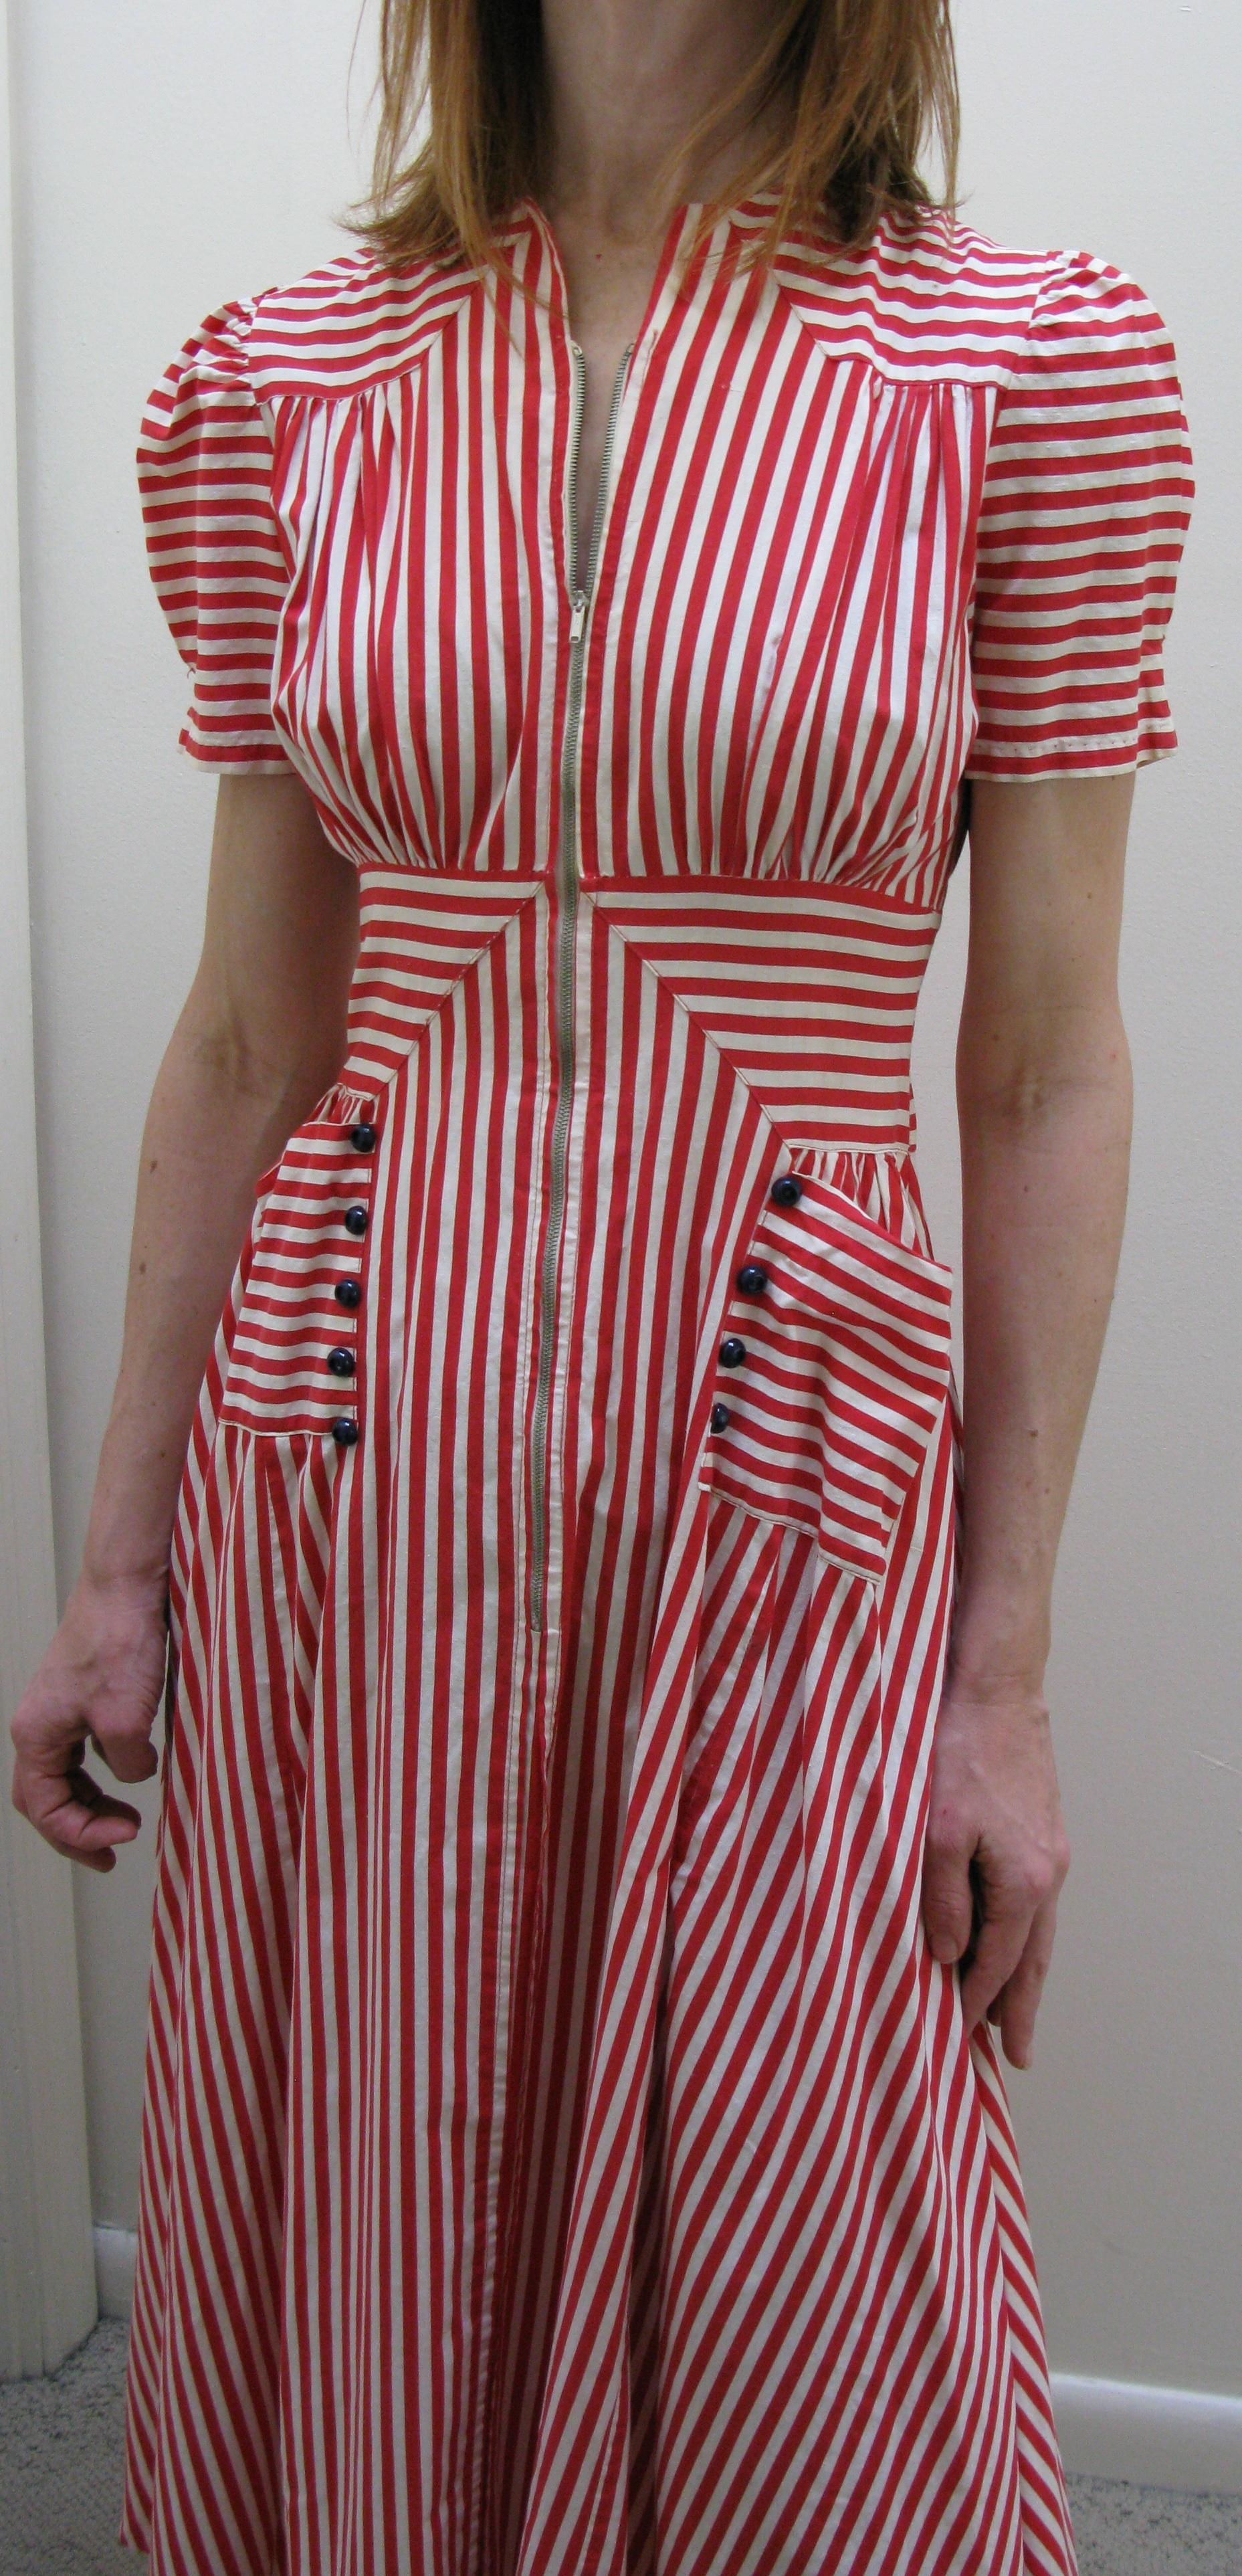 40s striped dress with pockets